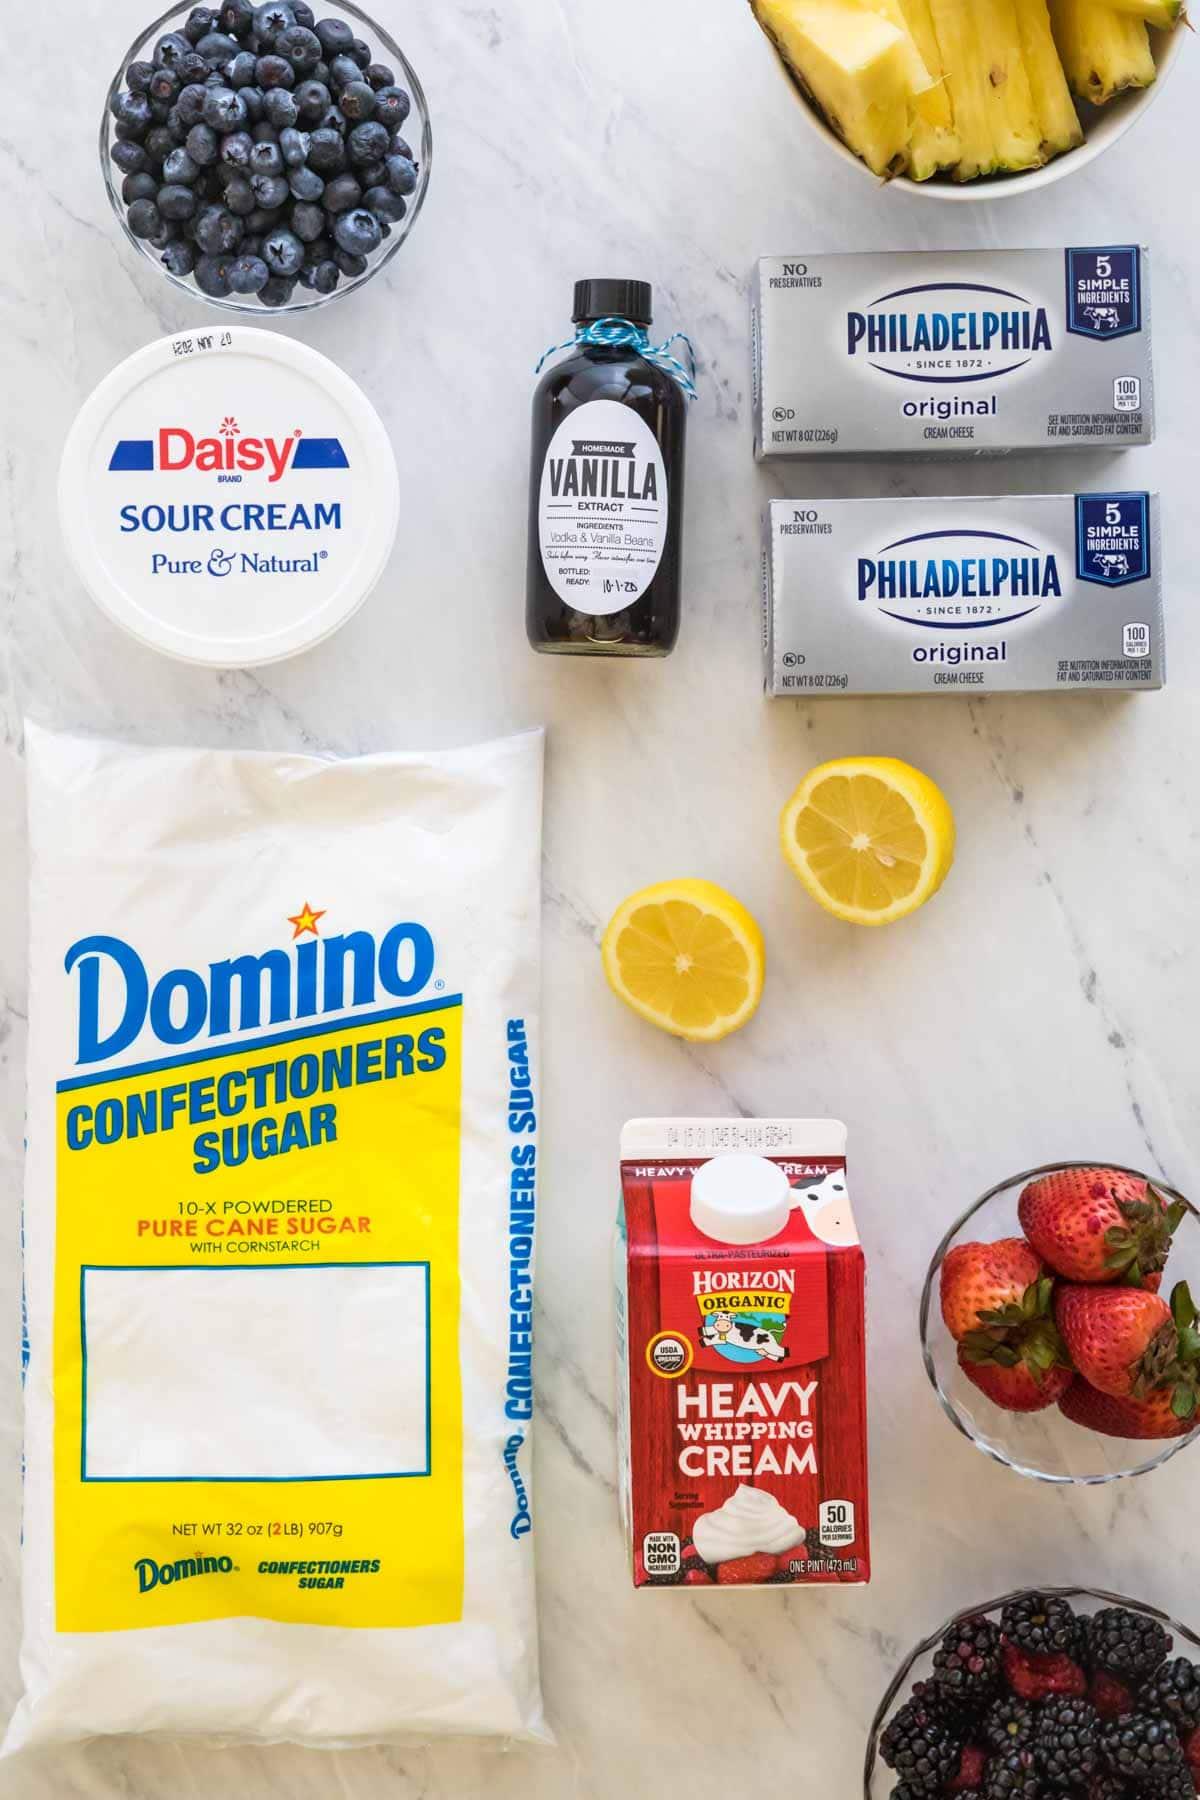 Sour cream, homemade vanilla extract, cream cheese, powdered sugar, and heavy whipping cream.